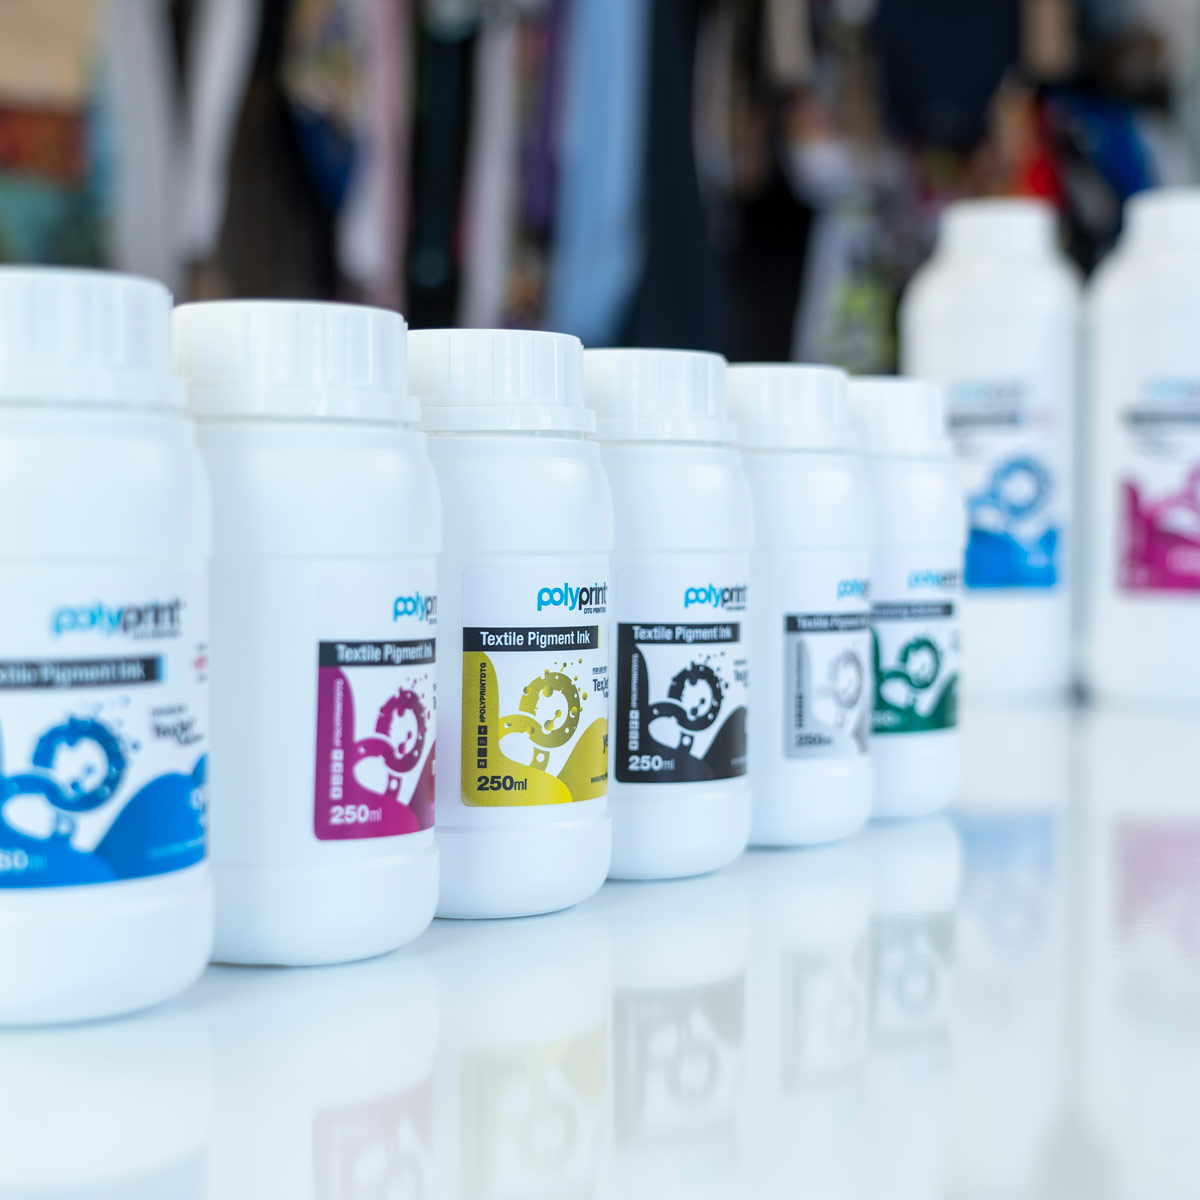 Polyprint Dupont Inks